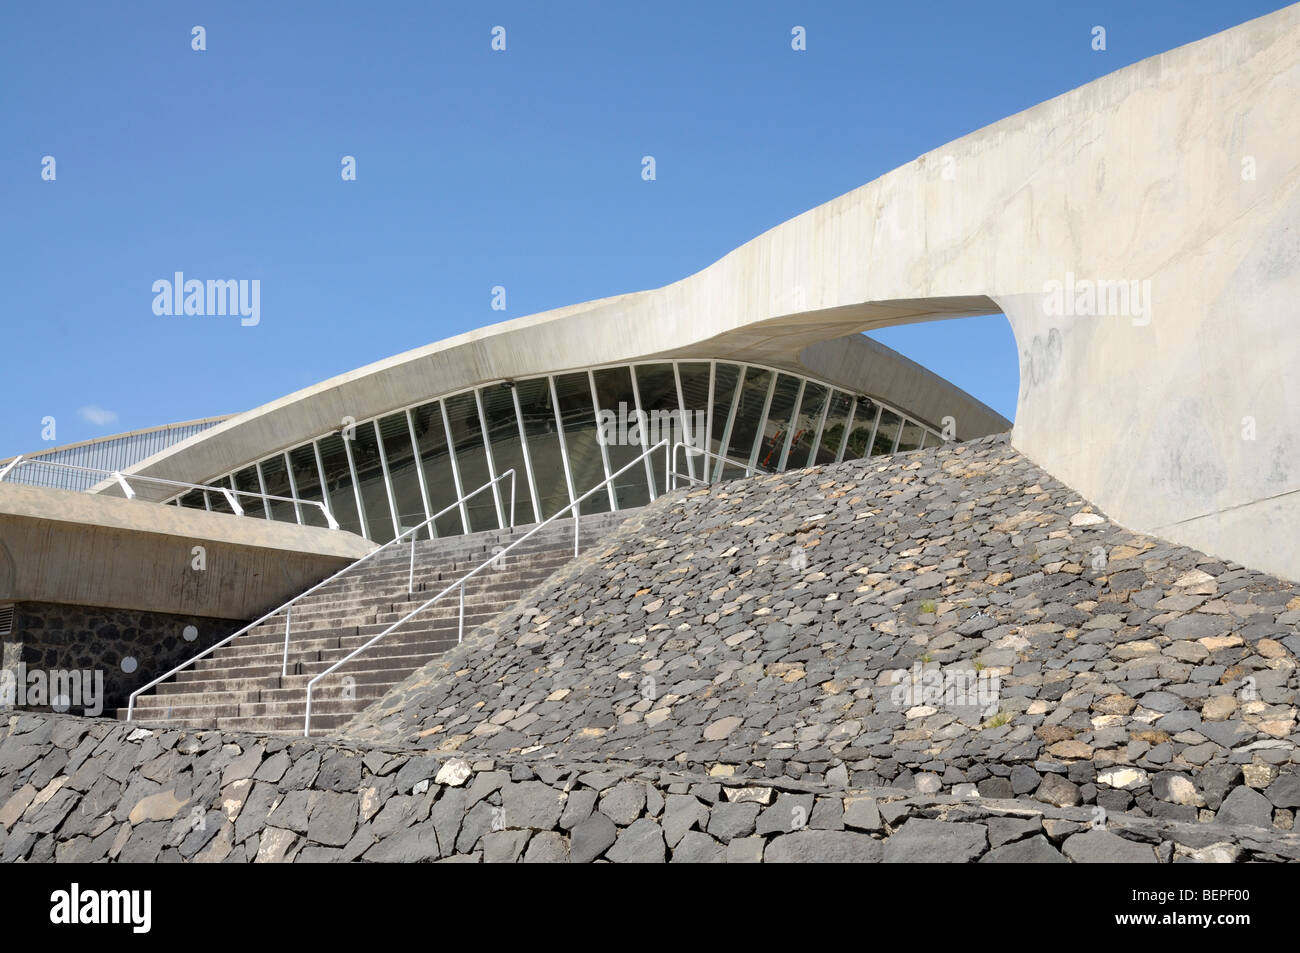 Modern Architecture Spain modern architecture in santa cruz de tenerife, spain stock photo